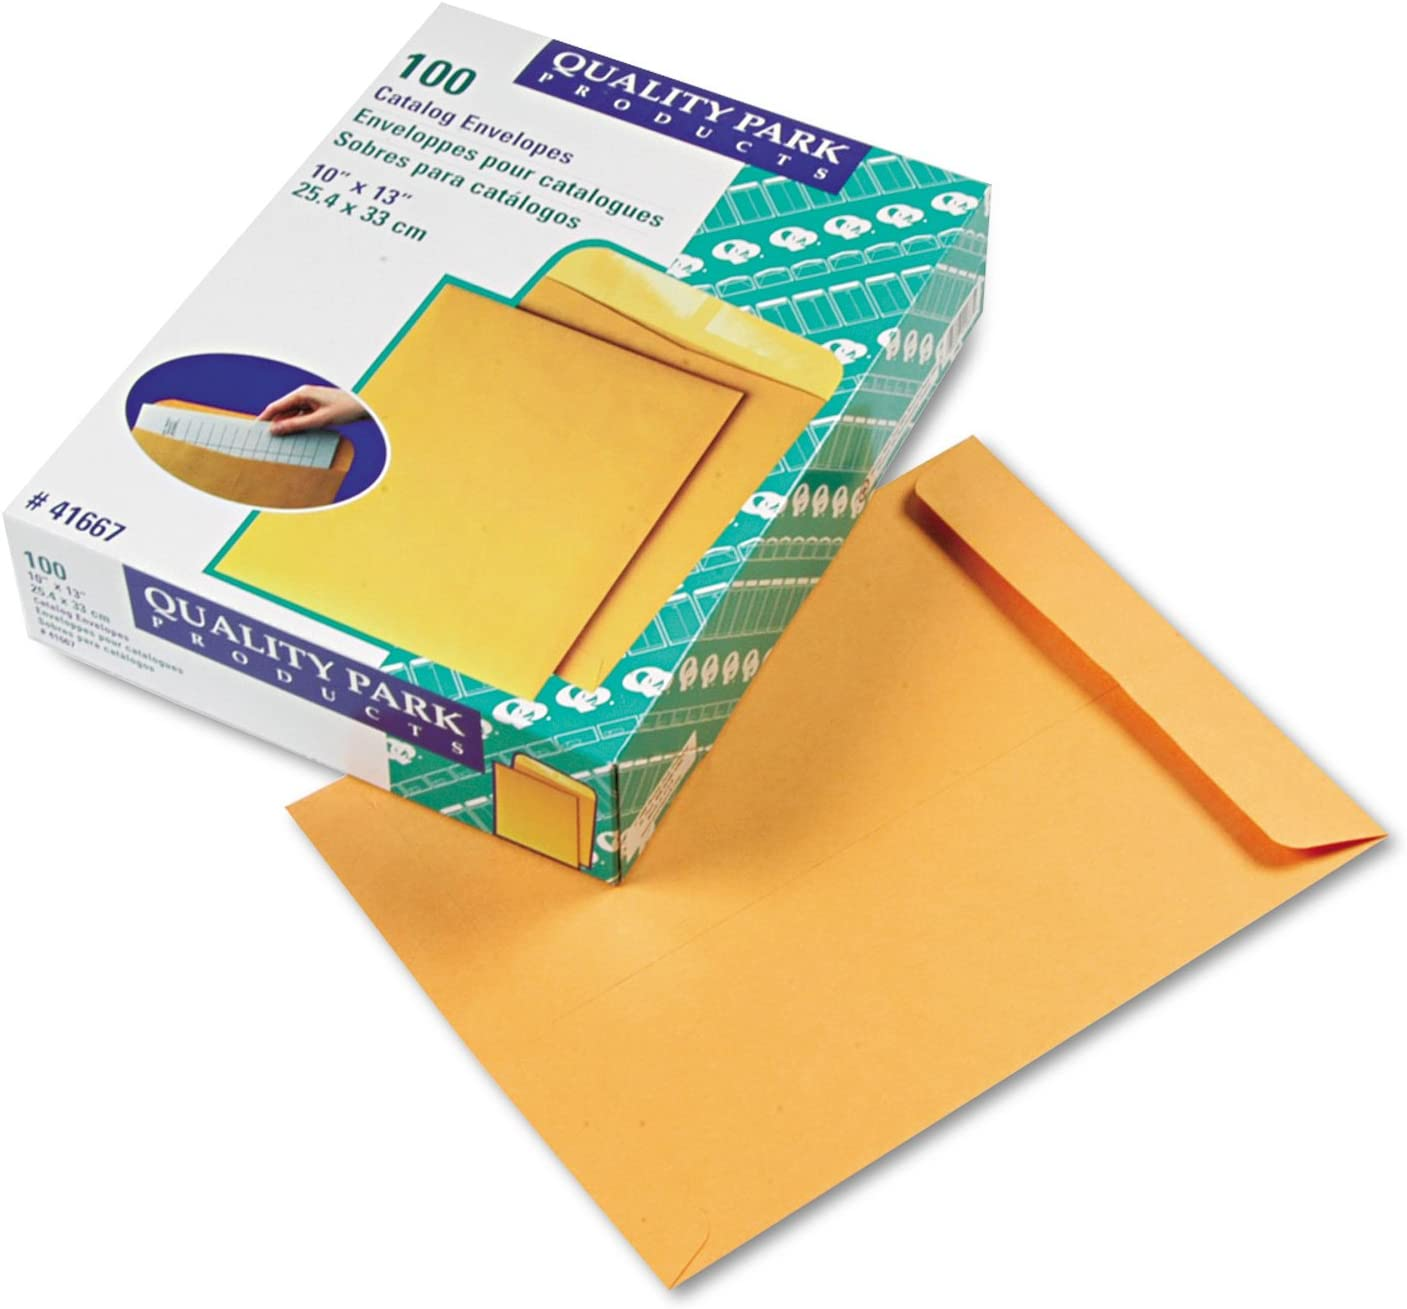 Quality Park Finally resale start 41667 Catalog Envelope 10 Japan's largest assortment 100 Kraft x B Brown 13